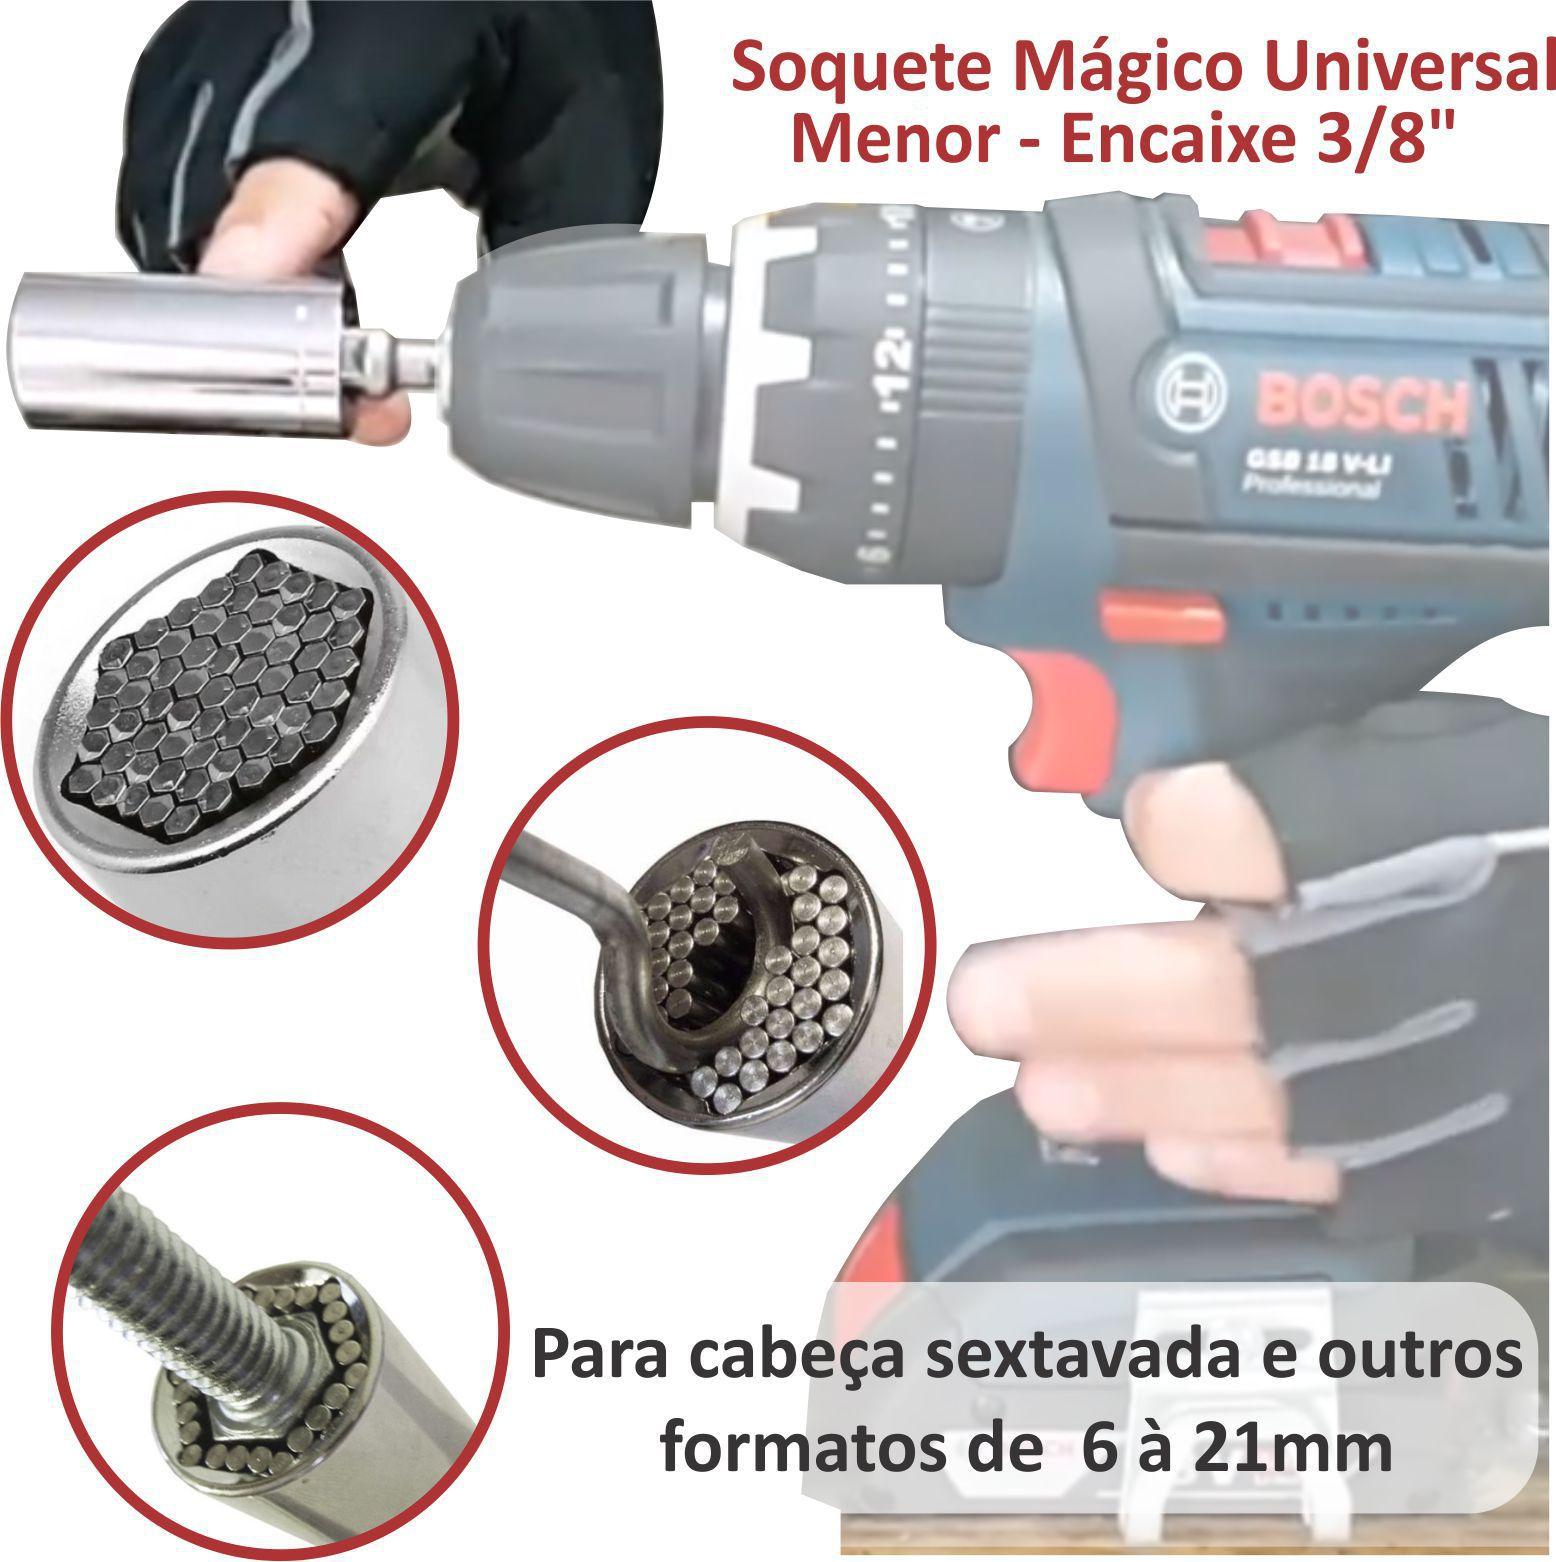 "Soquete Mágico Universal Multidimensional Menor c/ Encaixe 3/8"""